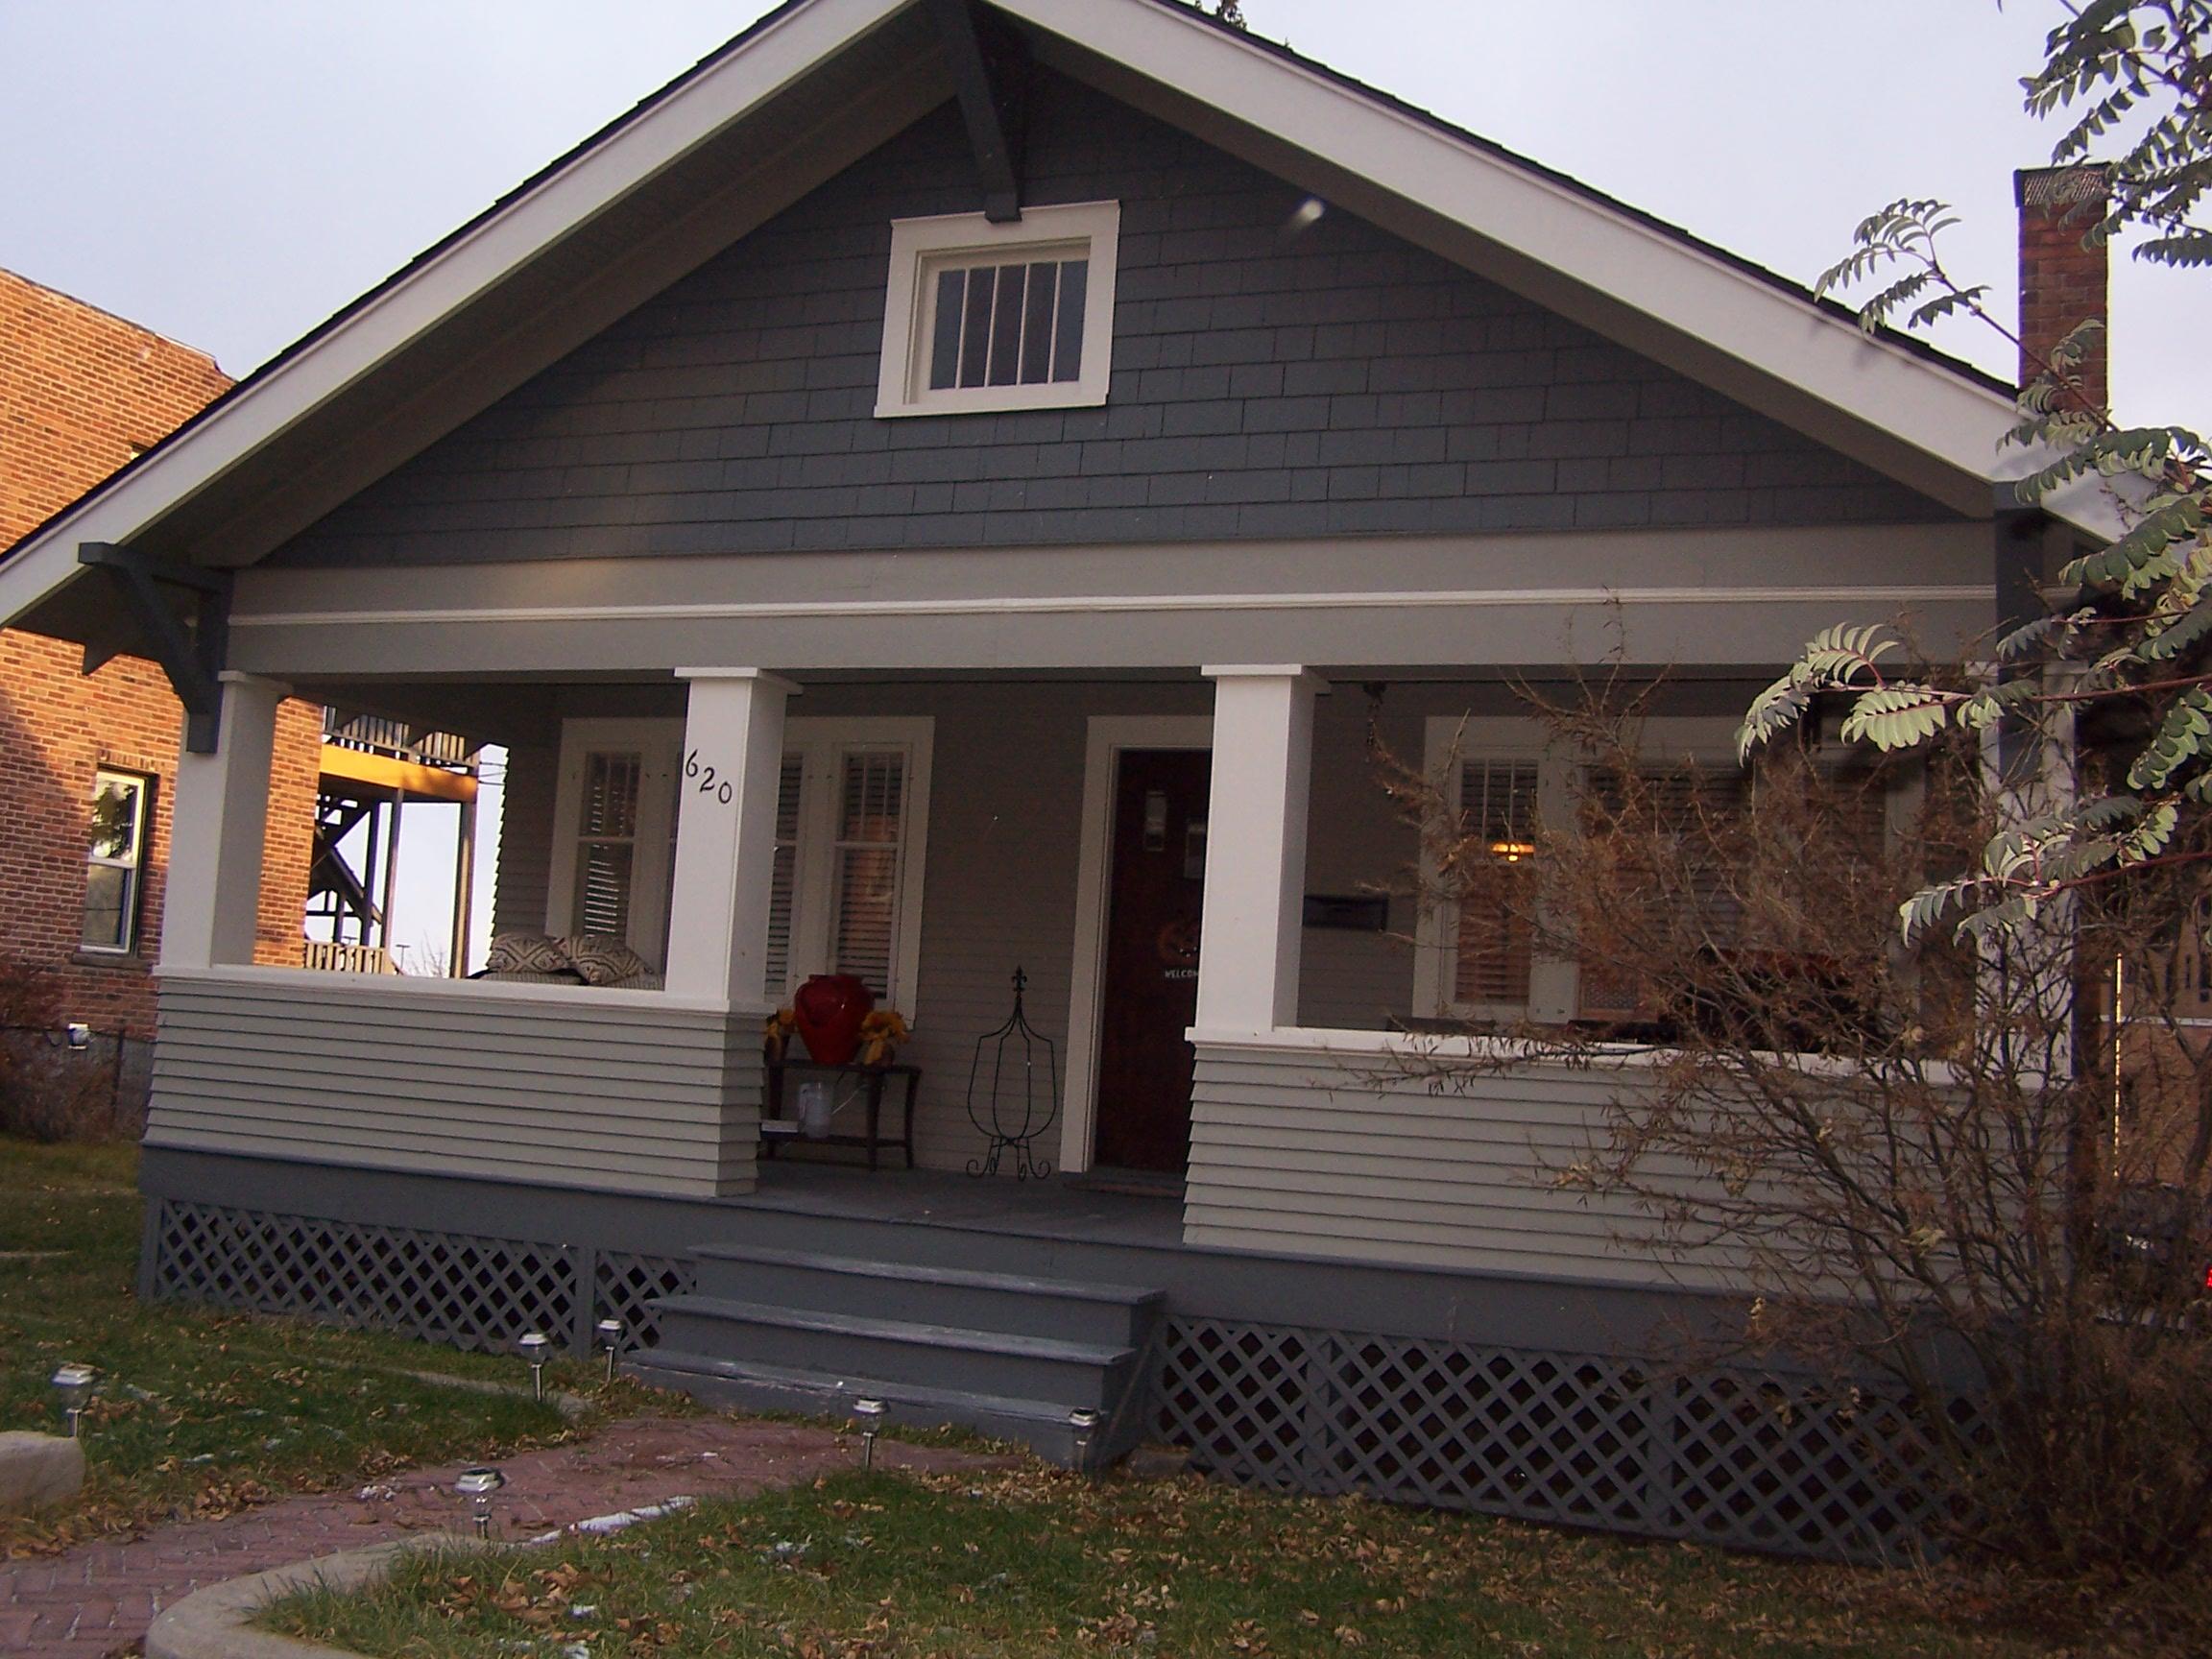 2 620 Silver Exterior front porch 2.JPG